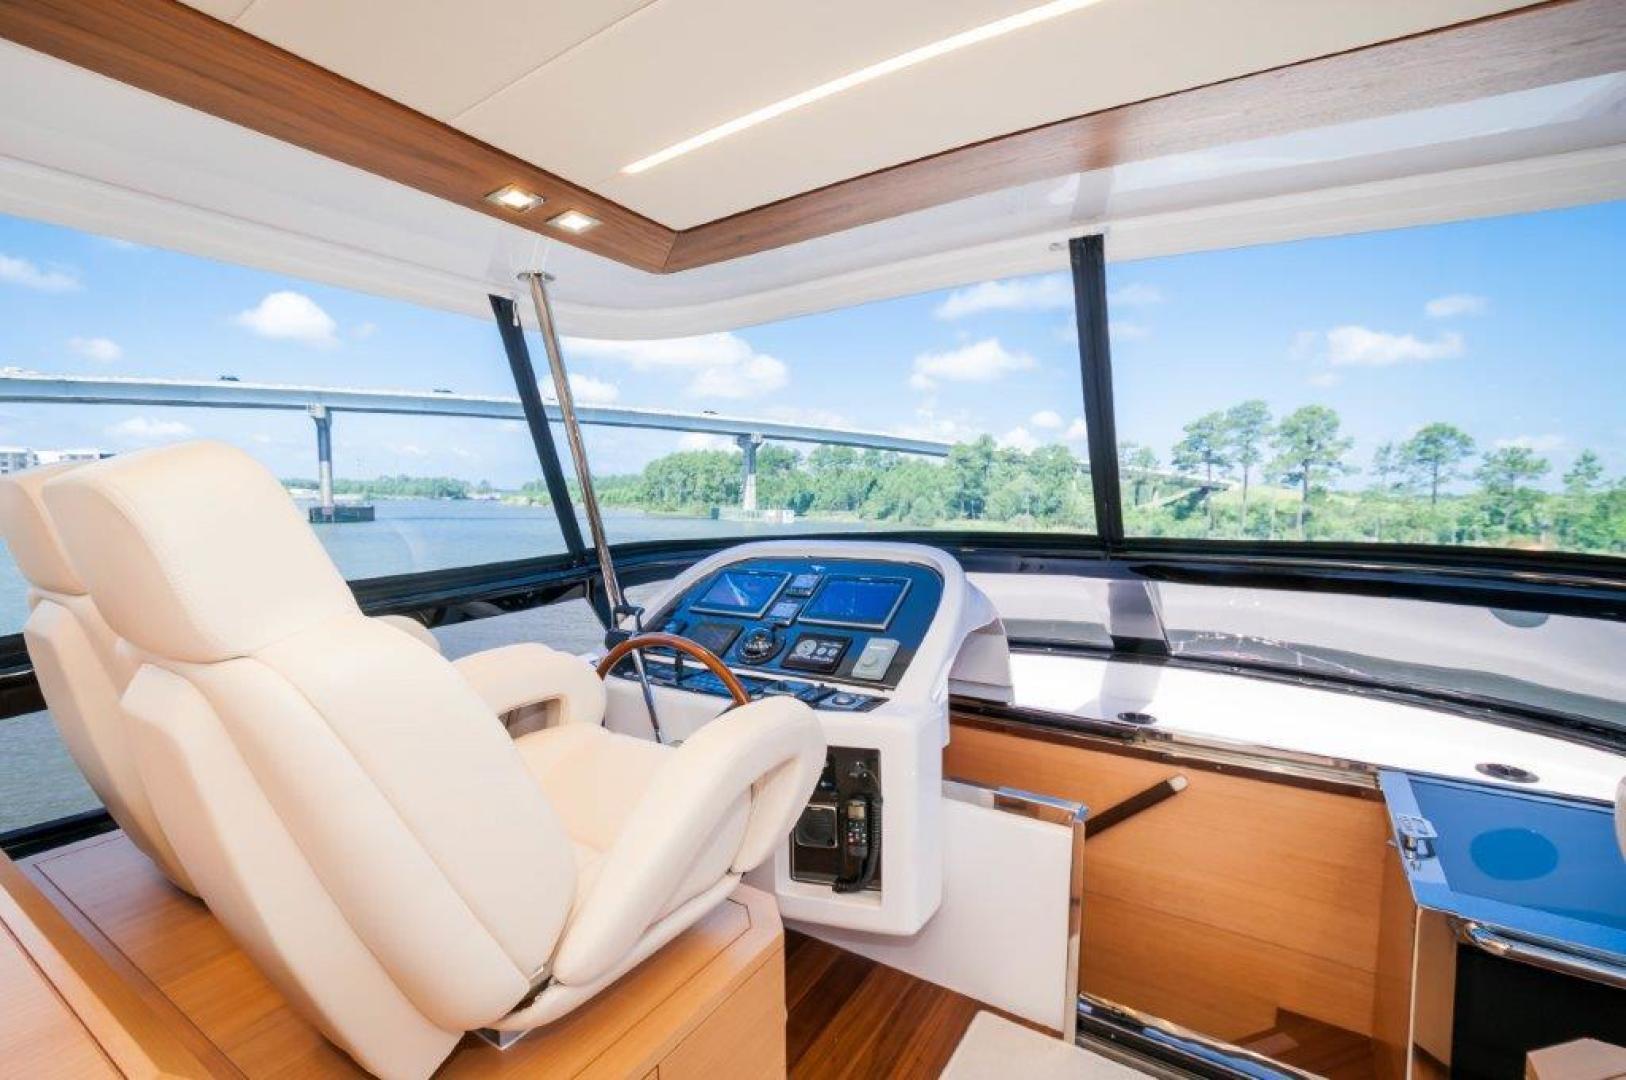 Maiora-84 Motor Yacht 2015-Never Rest SANDESTIN-Florida-United States-2015 Maiora 84 Motor Yacht Flybridge Helm Never Rest-720592 | Thumbnail